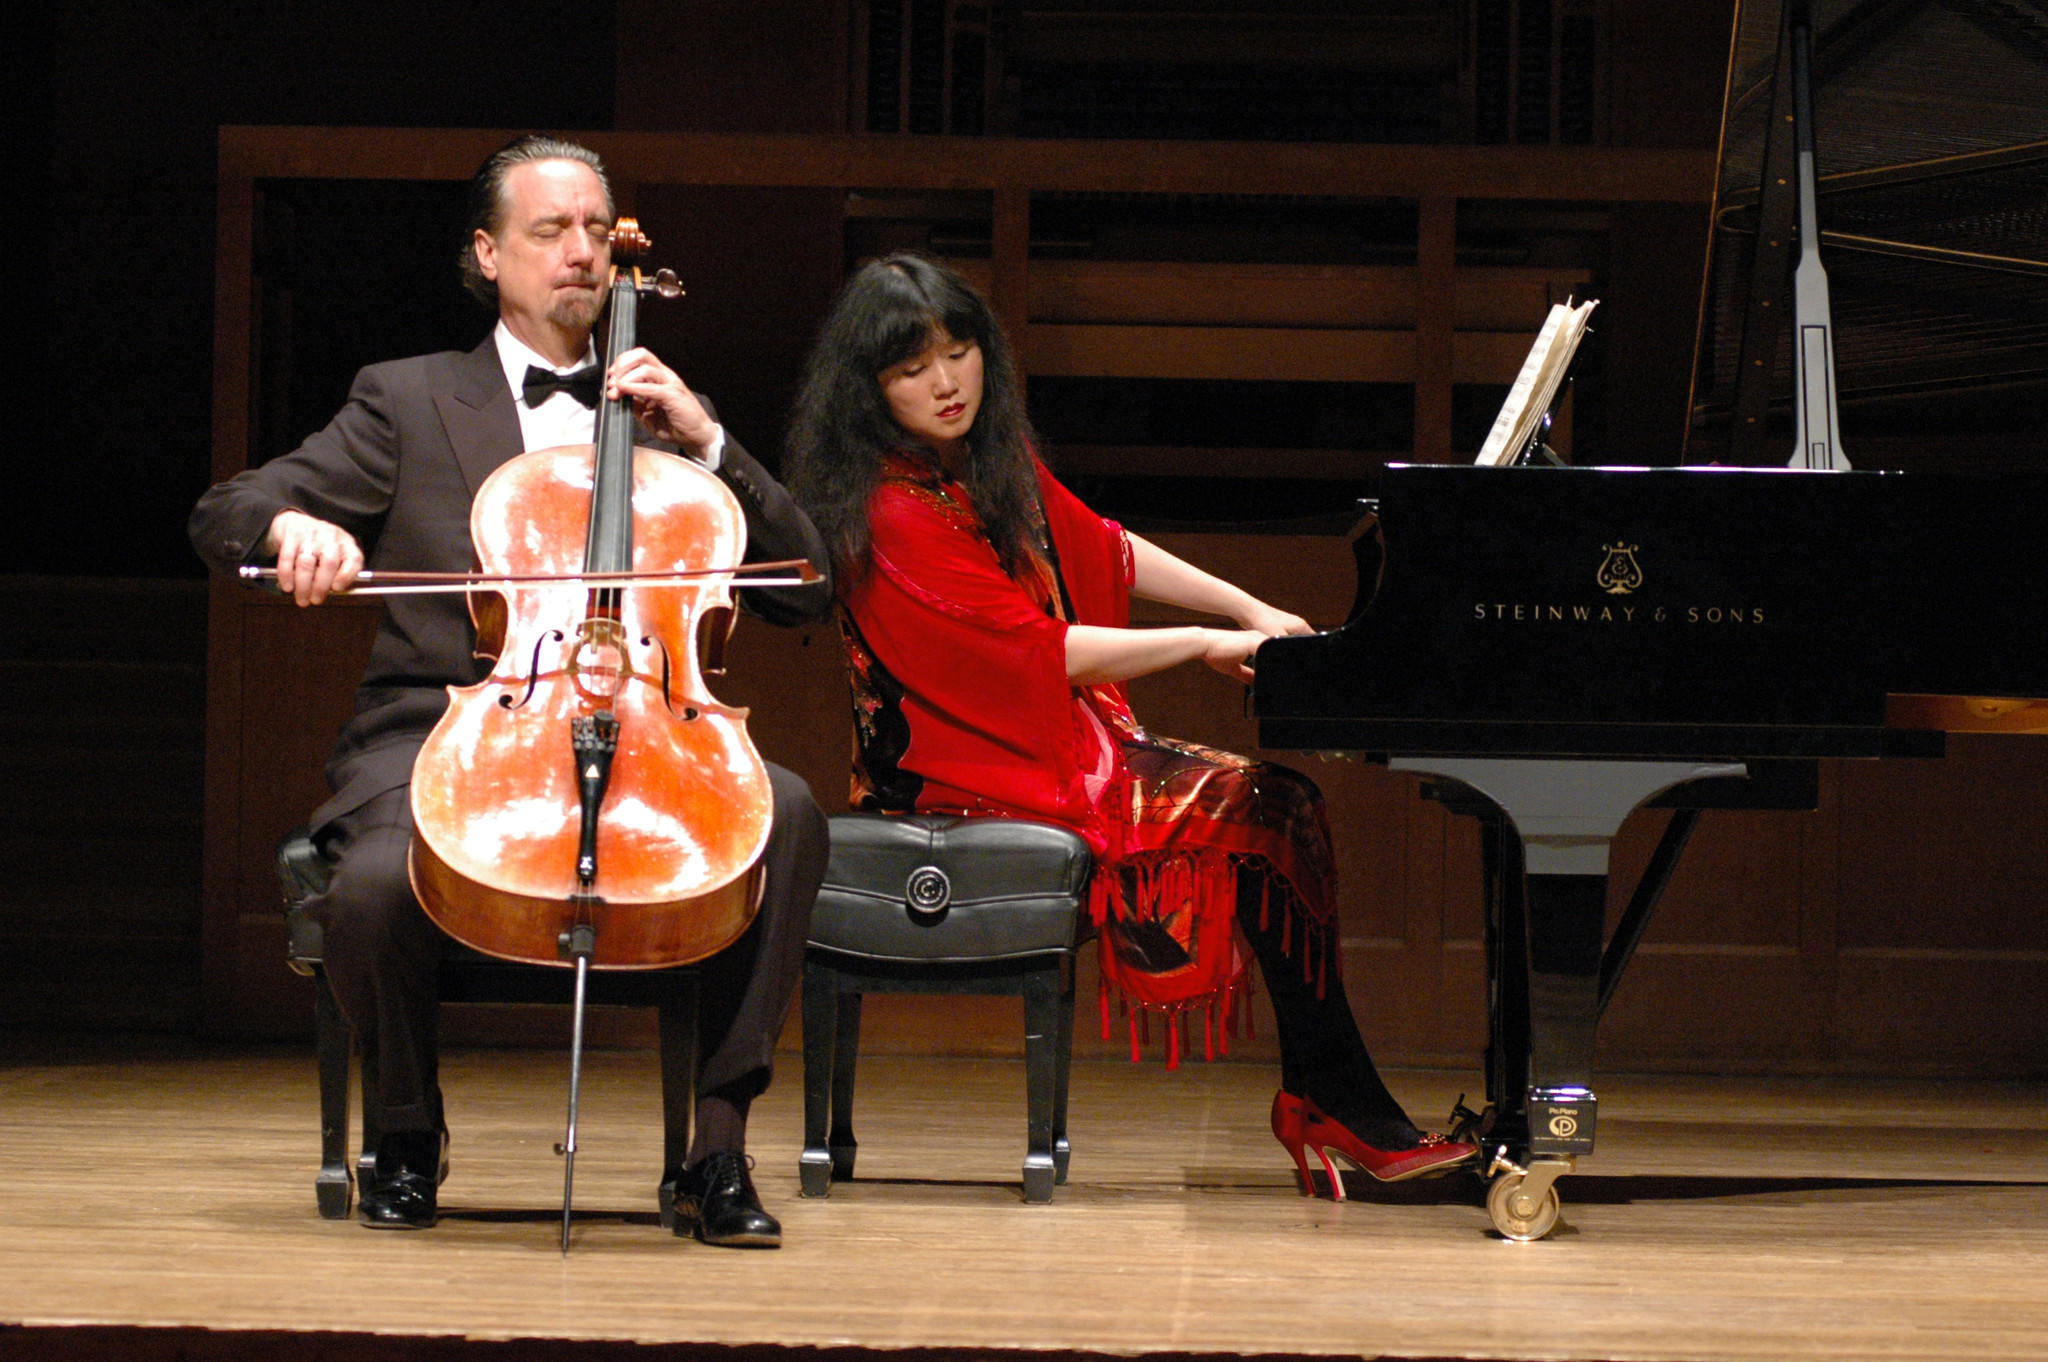 David Finckel and Wu Han perform together.